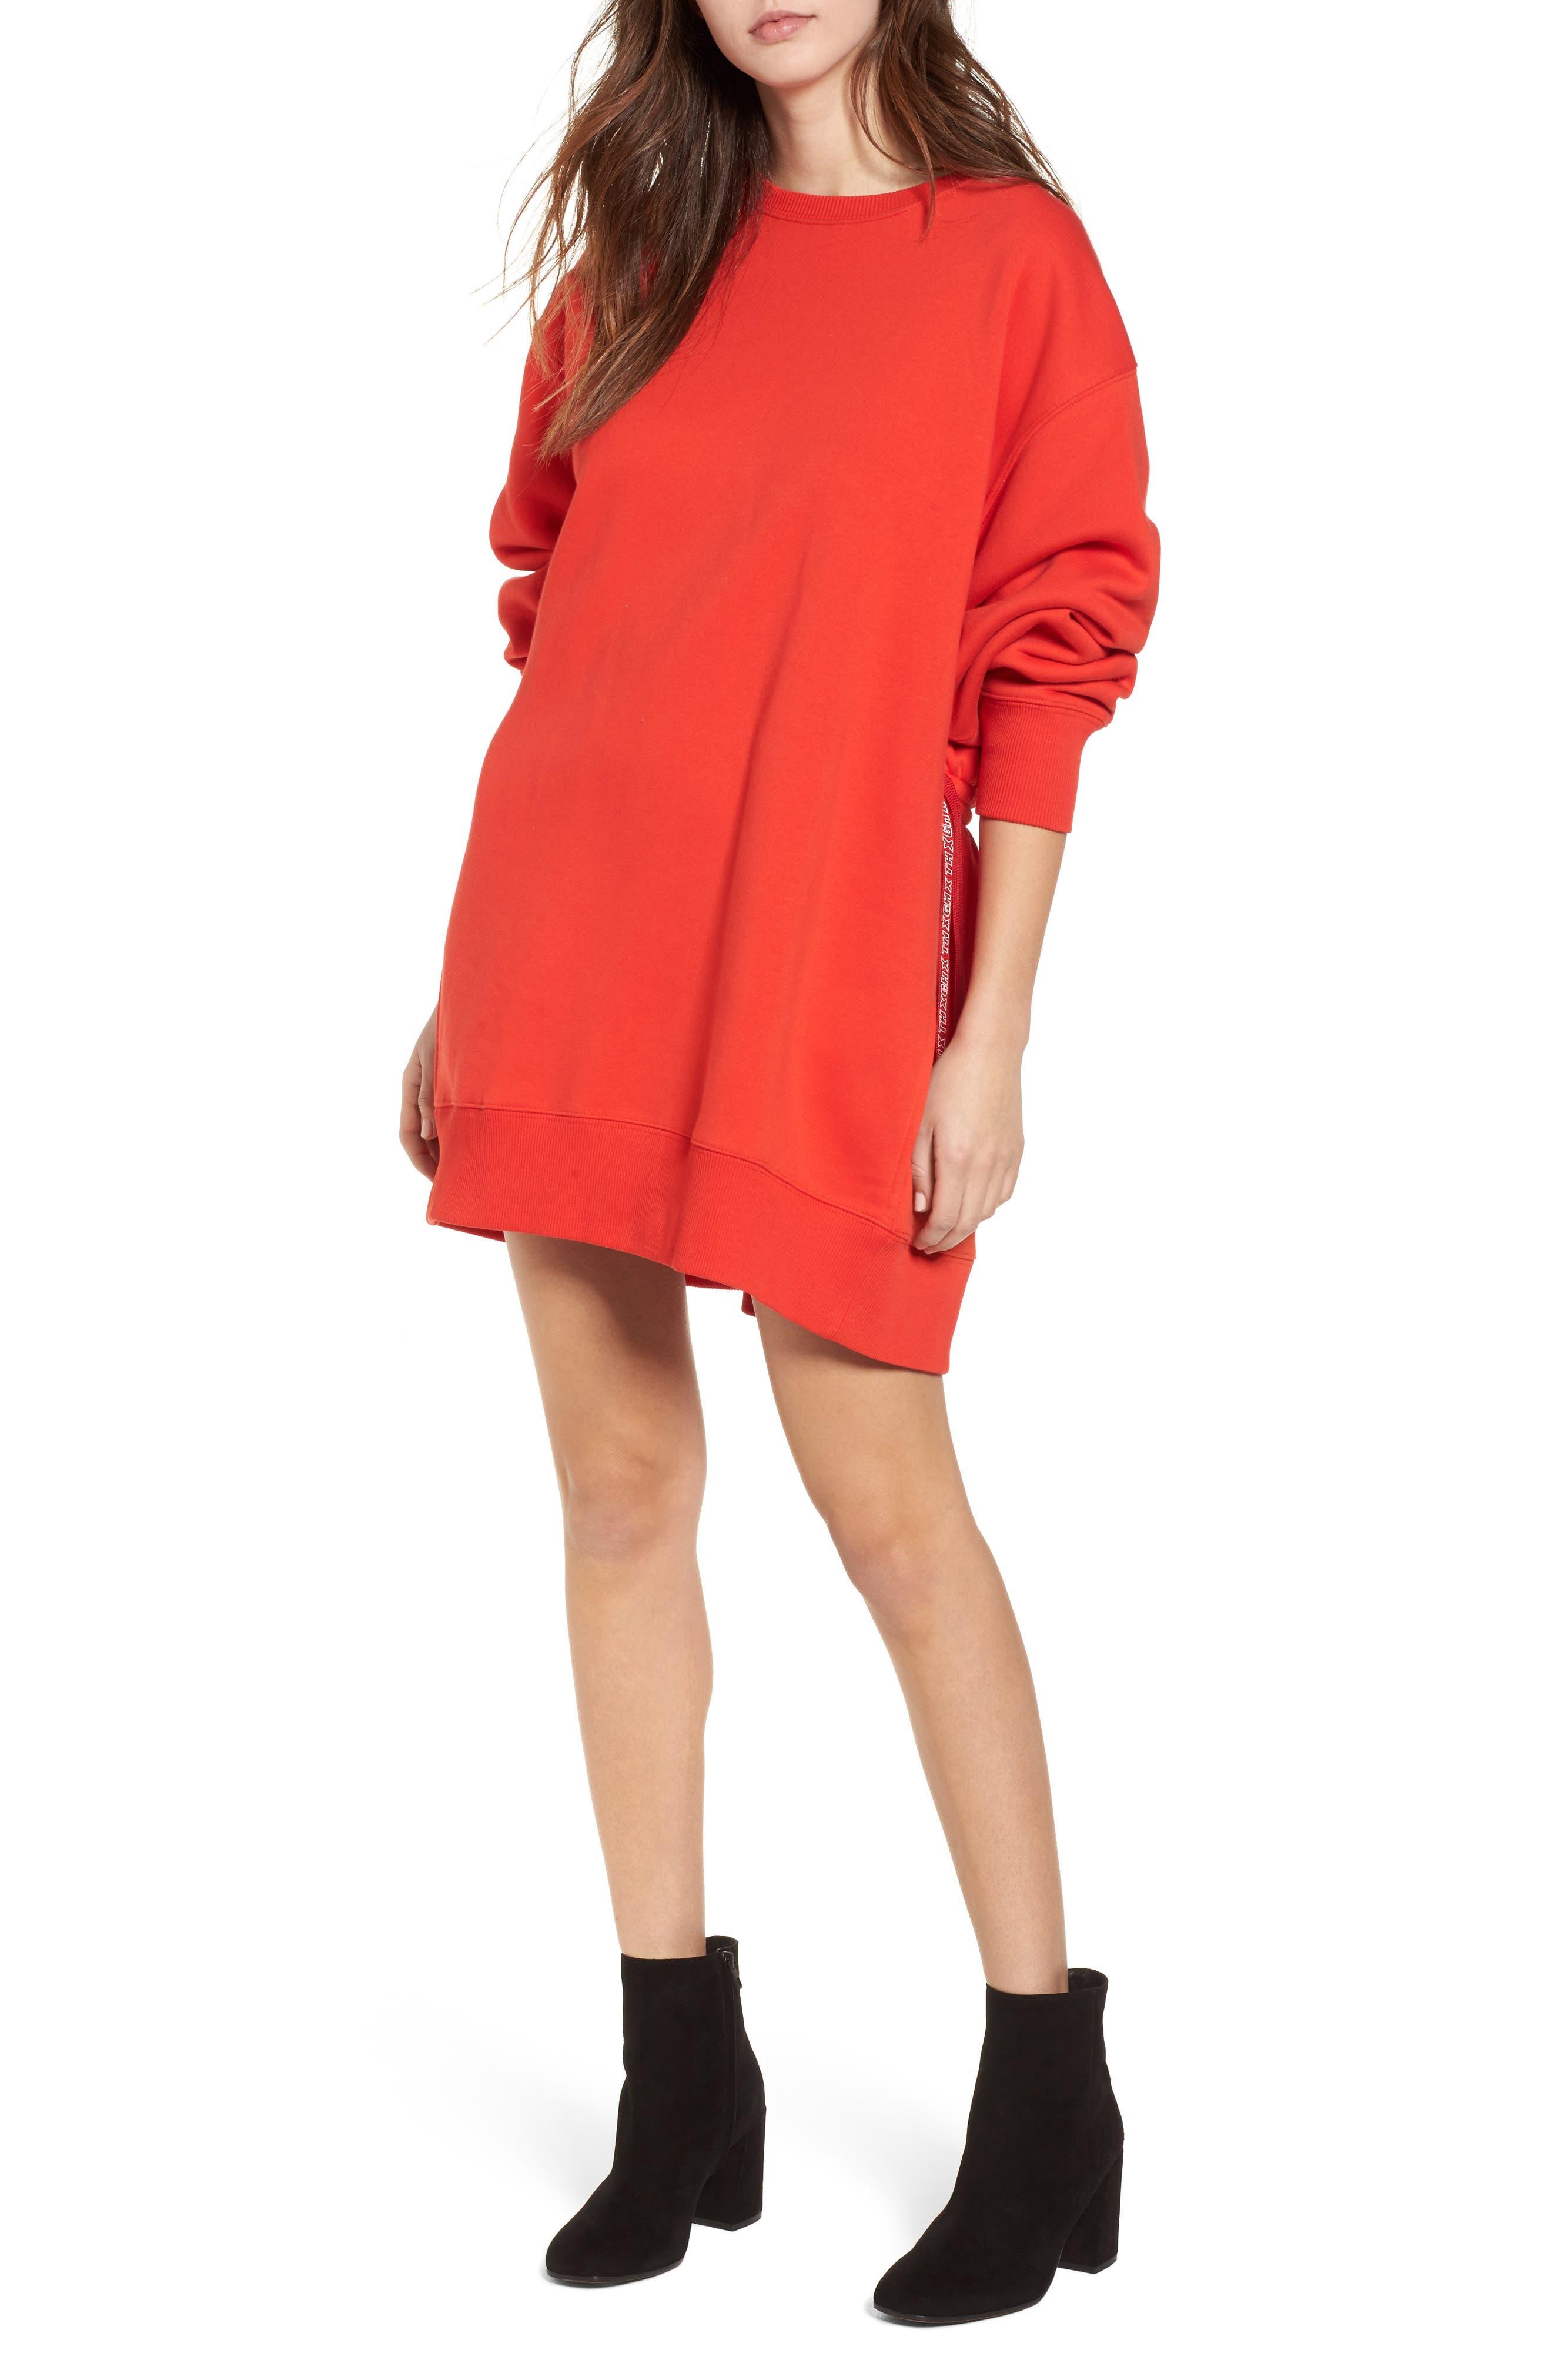 x Gigi Hadid Sweatshirt Dress,                         Main,                         color, Flame Scarlet